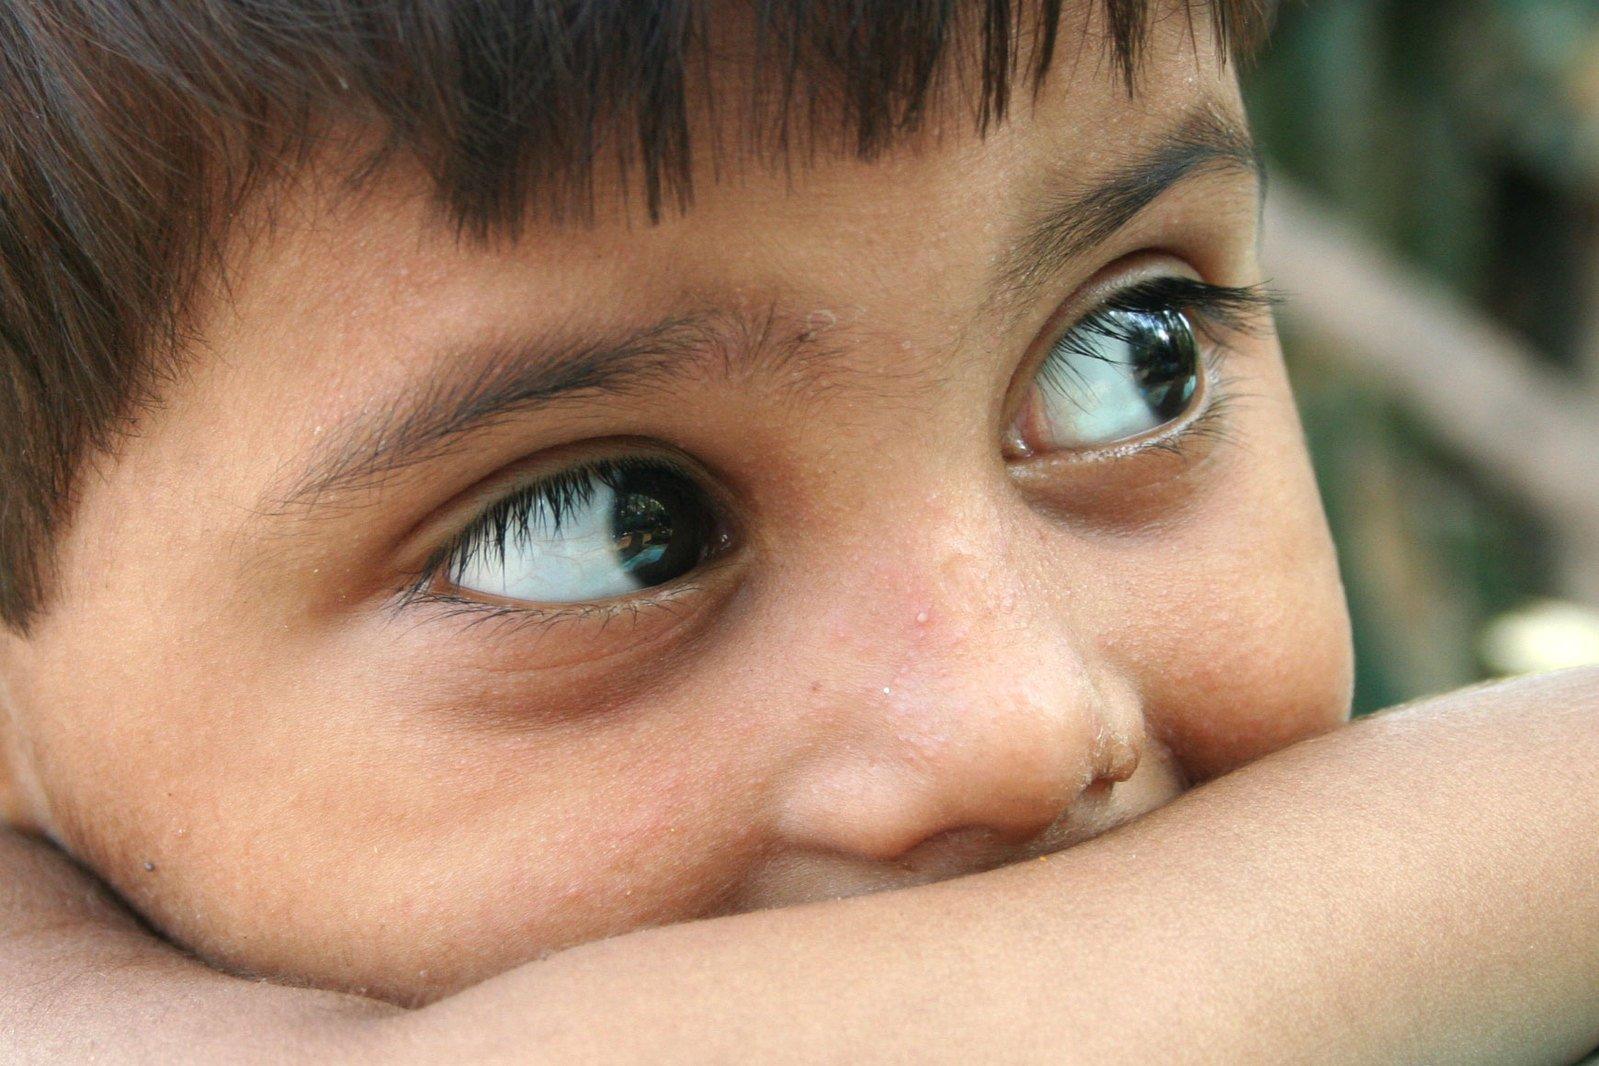 Stare,eyes,kid,baby